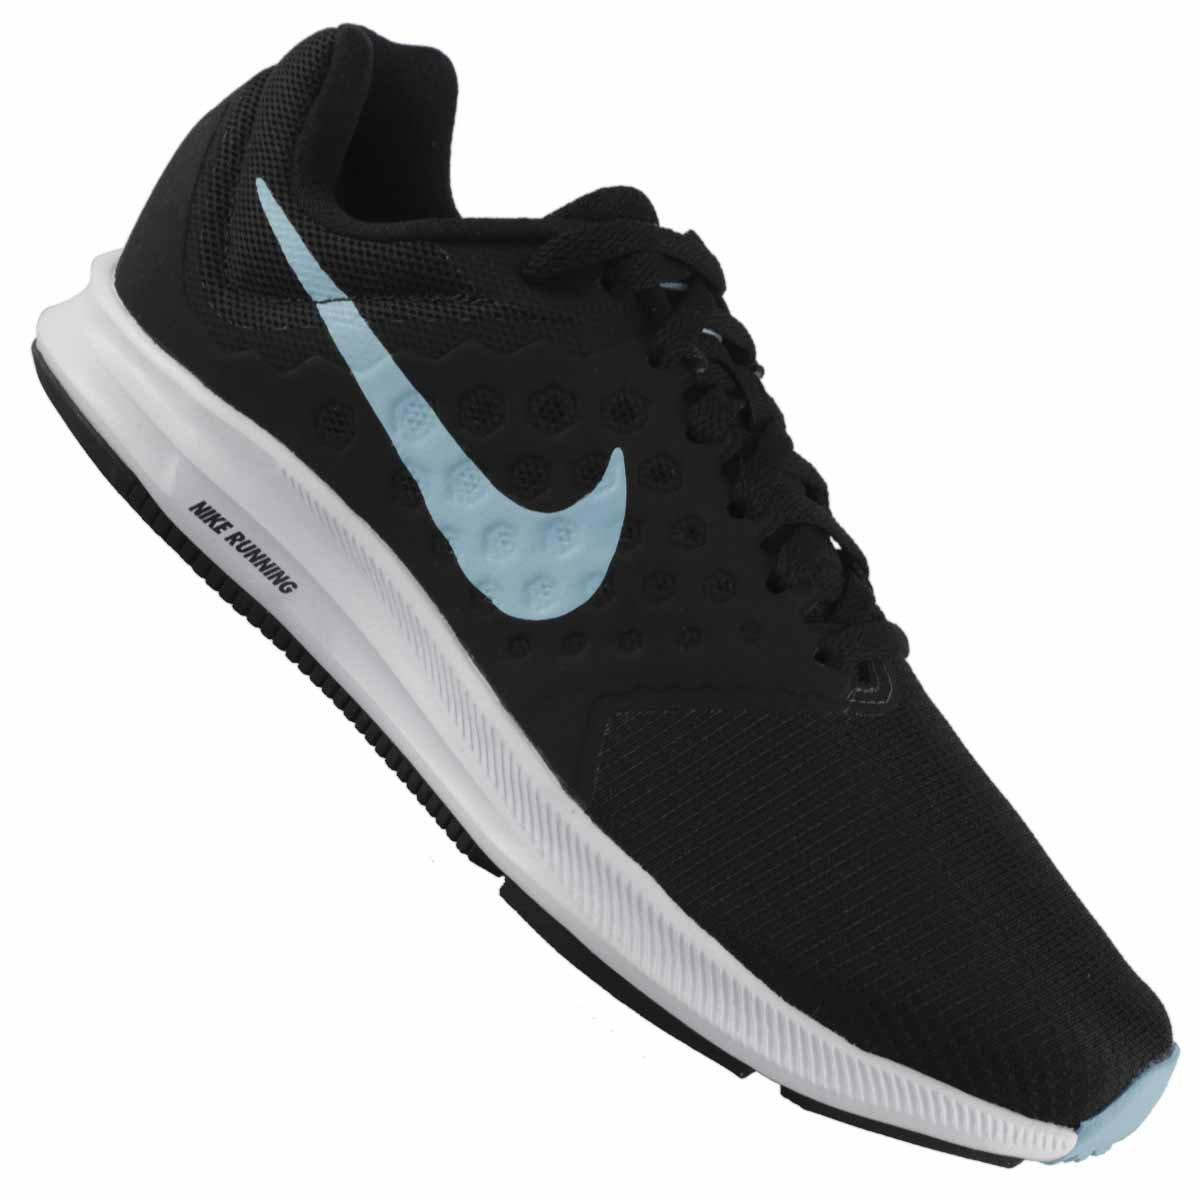 c3a2094727 Tênis Nike Downshifter 7 Feminino | Treino e Corrida